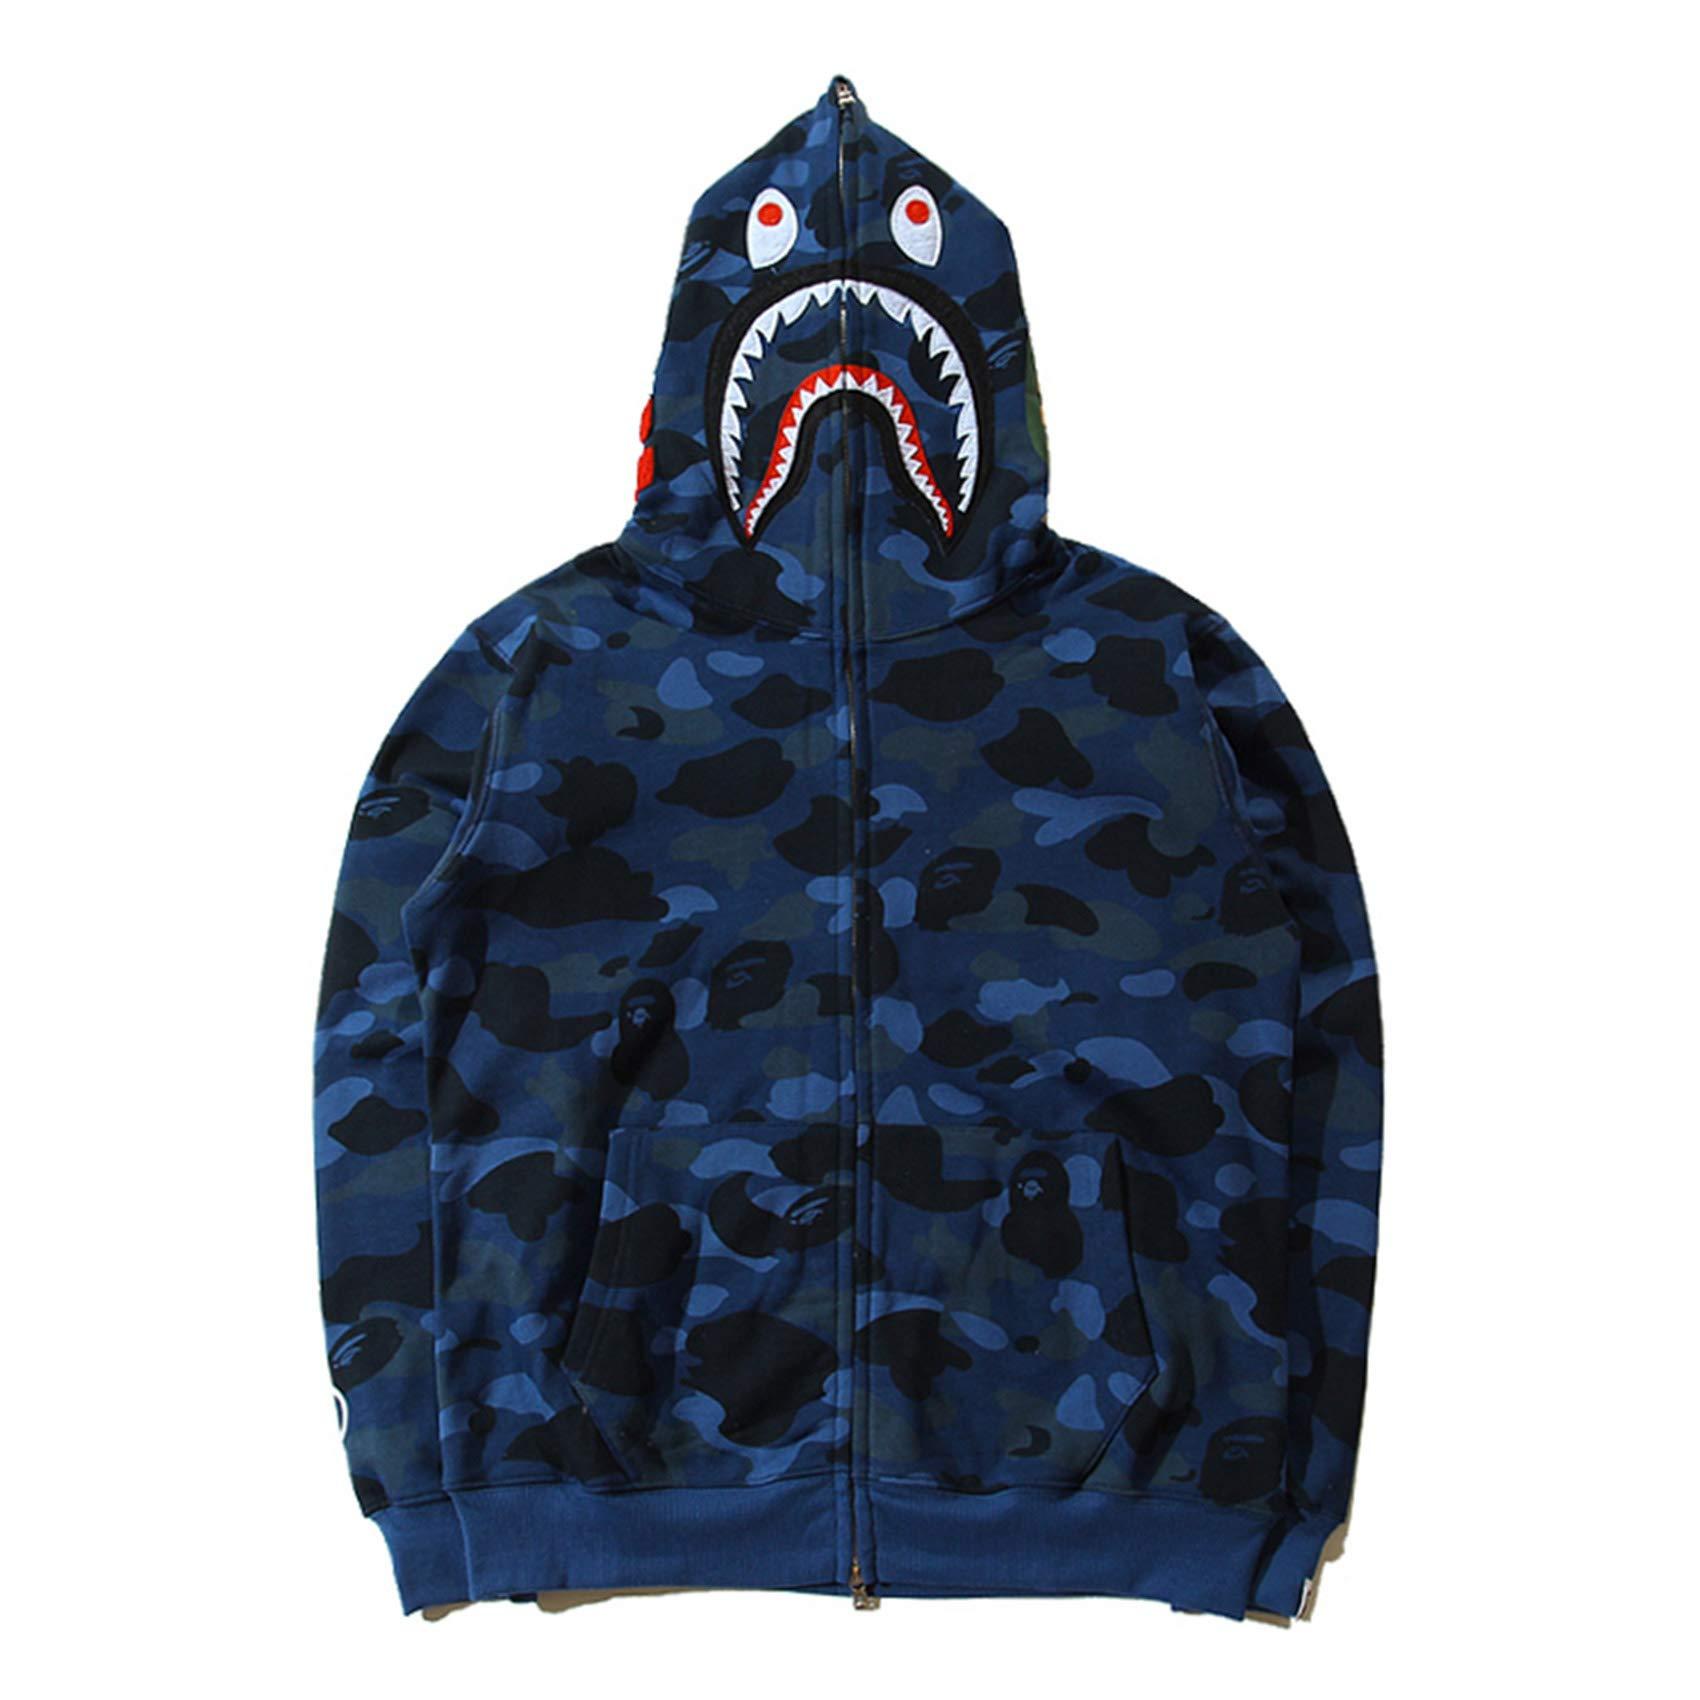 EWW Shark Ape Bape Camo Mens Women Hoodies Sweatershirt Casual Zip Up Hip-Hop Funny Tops